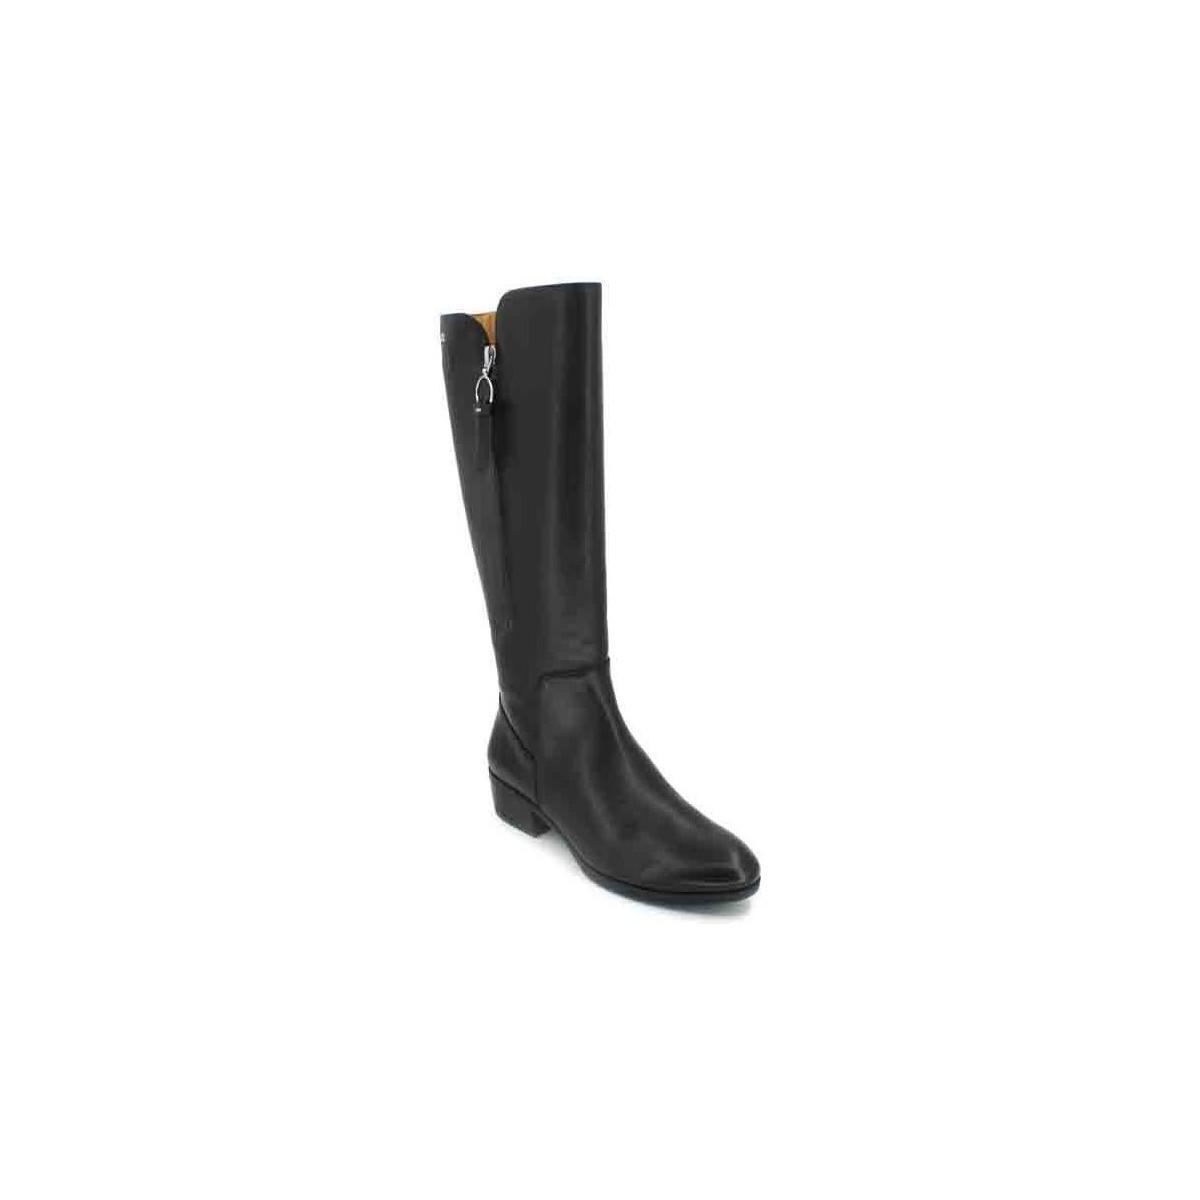 5be6bfc800ee Pikolinos Daroca W1u-9653 Women s Boots Women s High Boots In Black ...